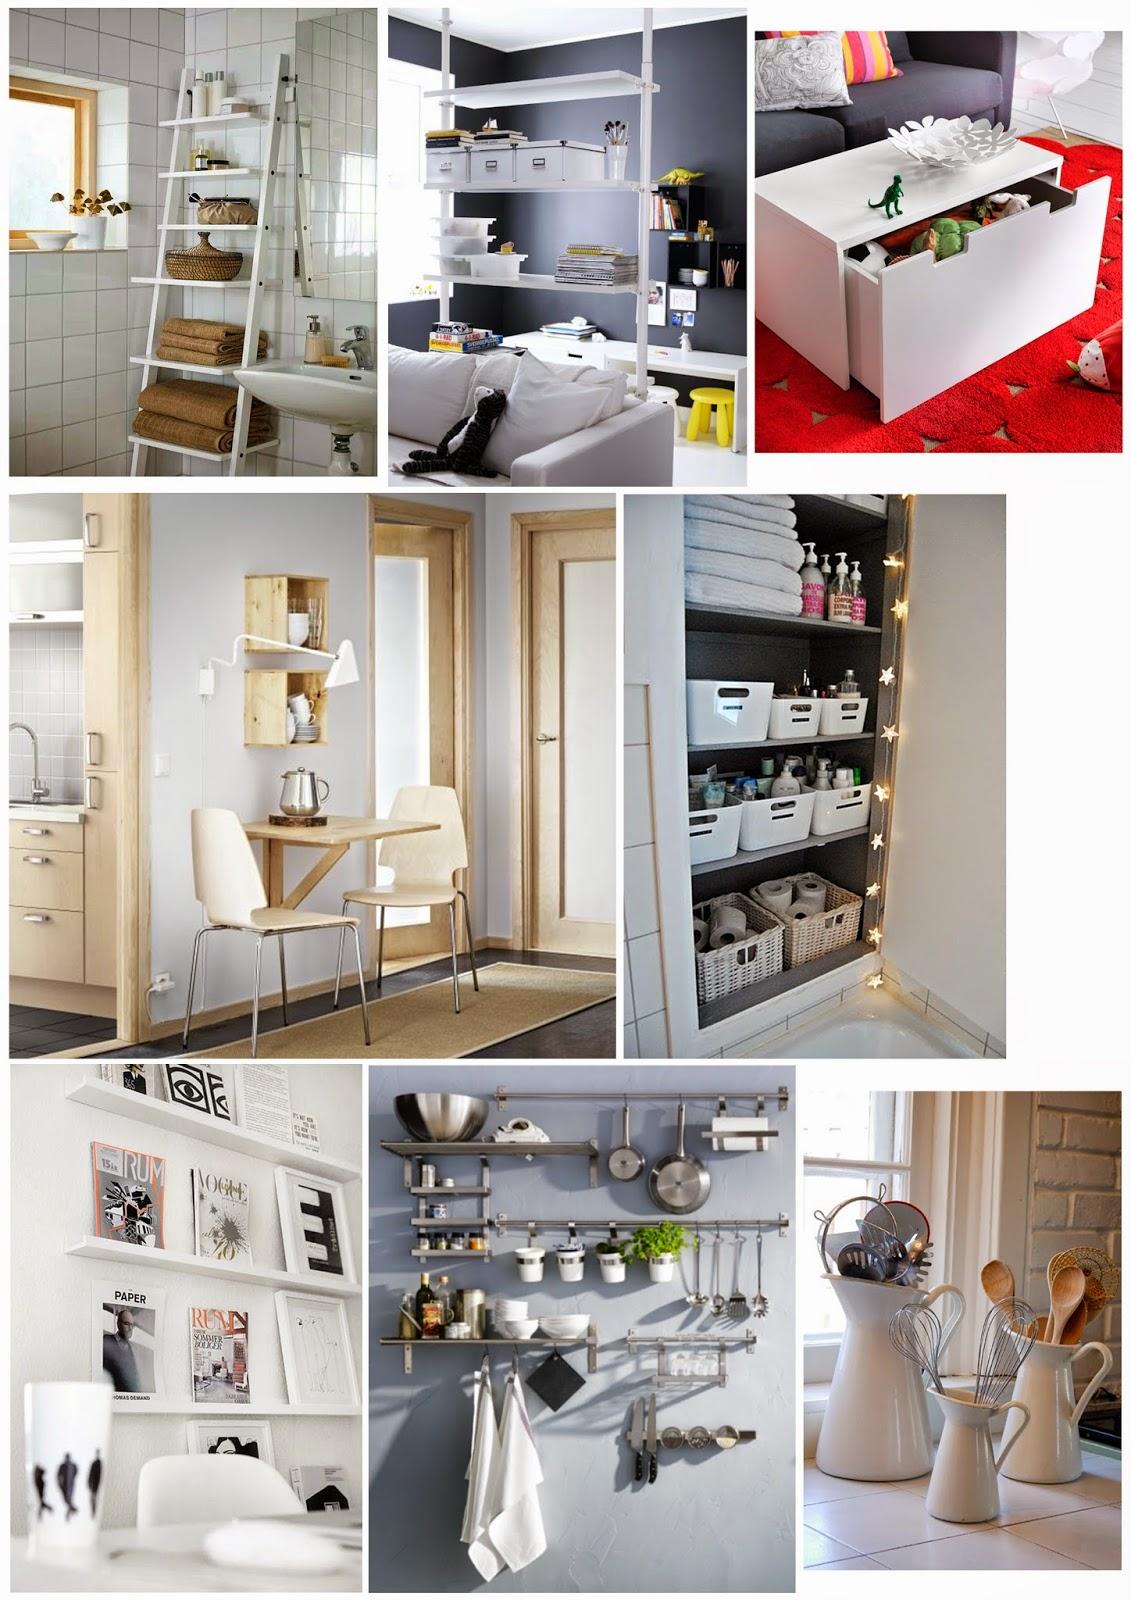 ikea space concept design interiors homewares